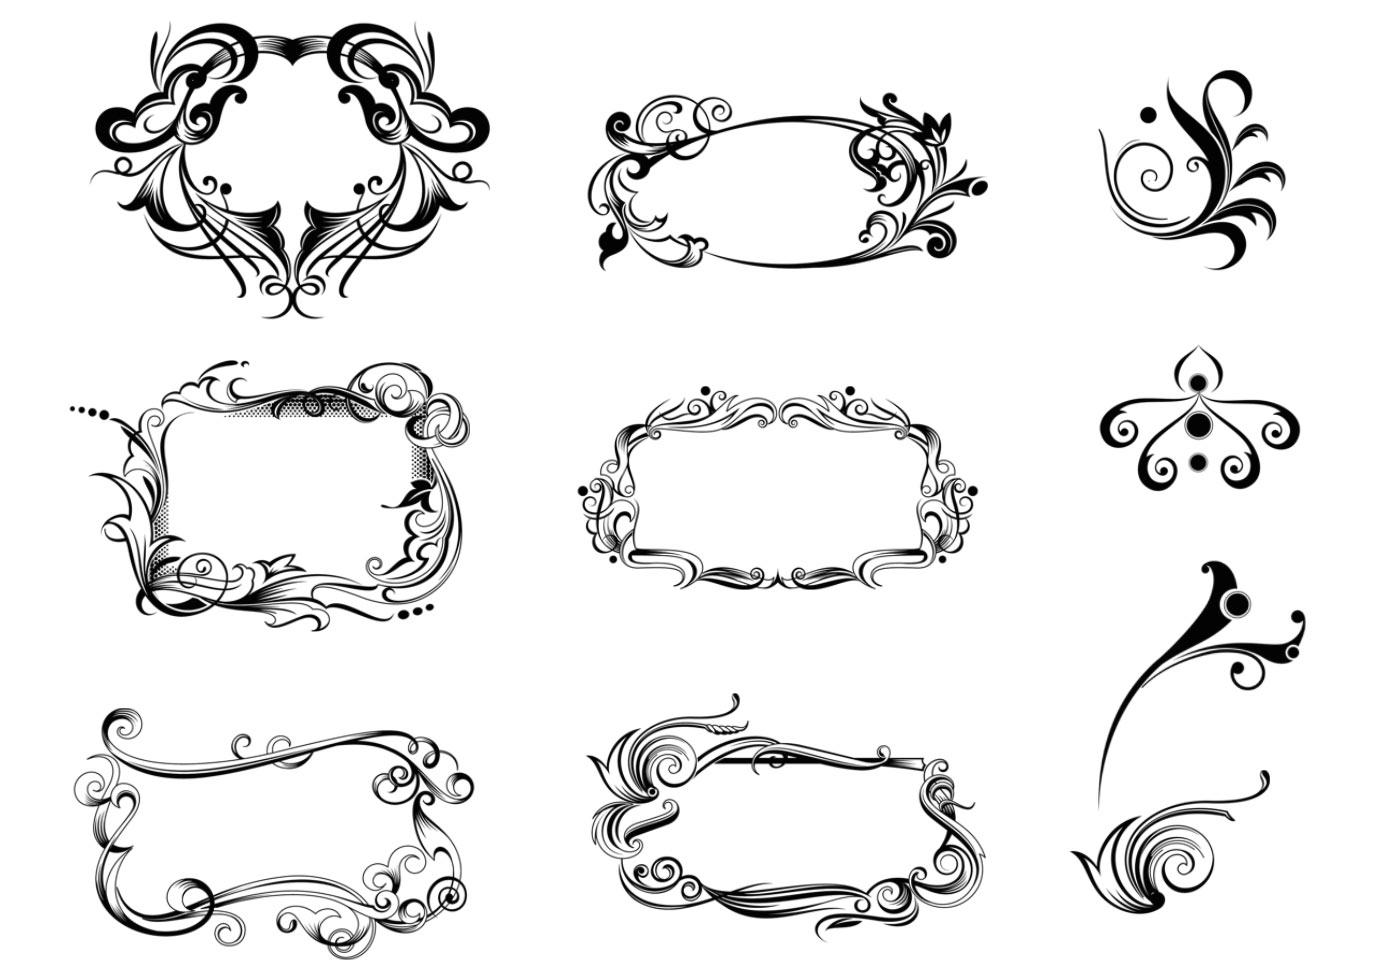 Decorative Ornament Vector Pack Download Free Vector Art